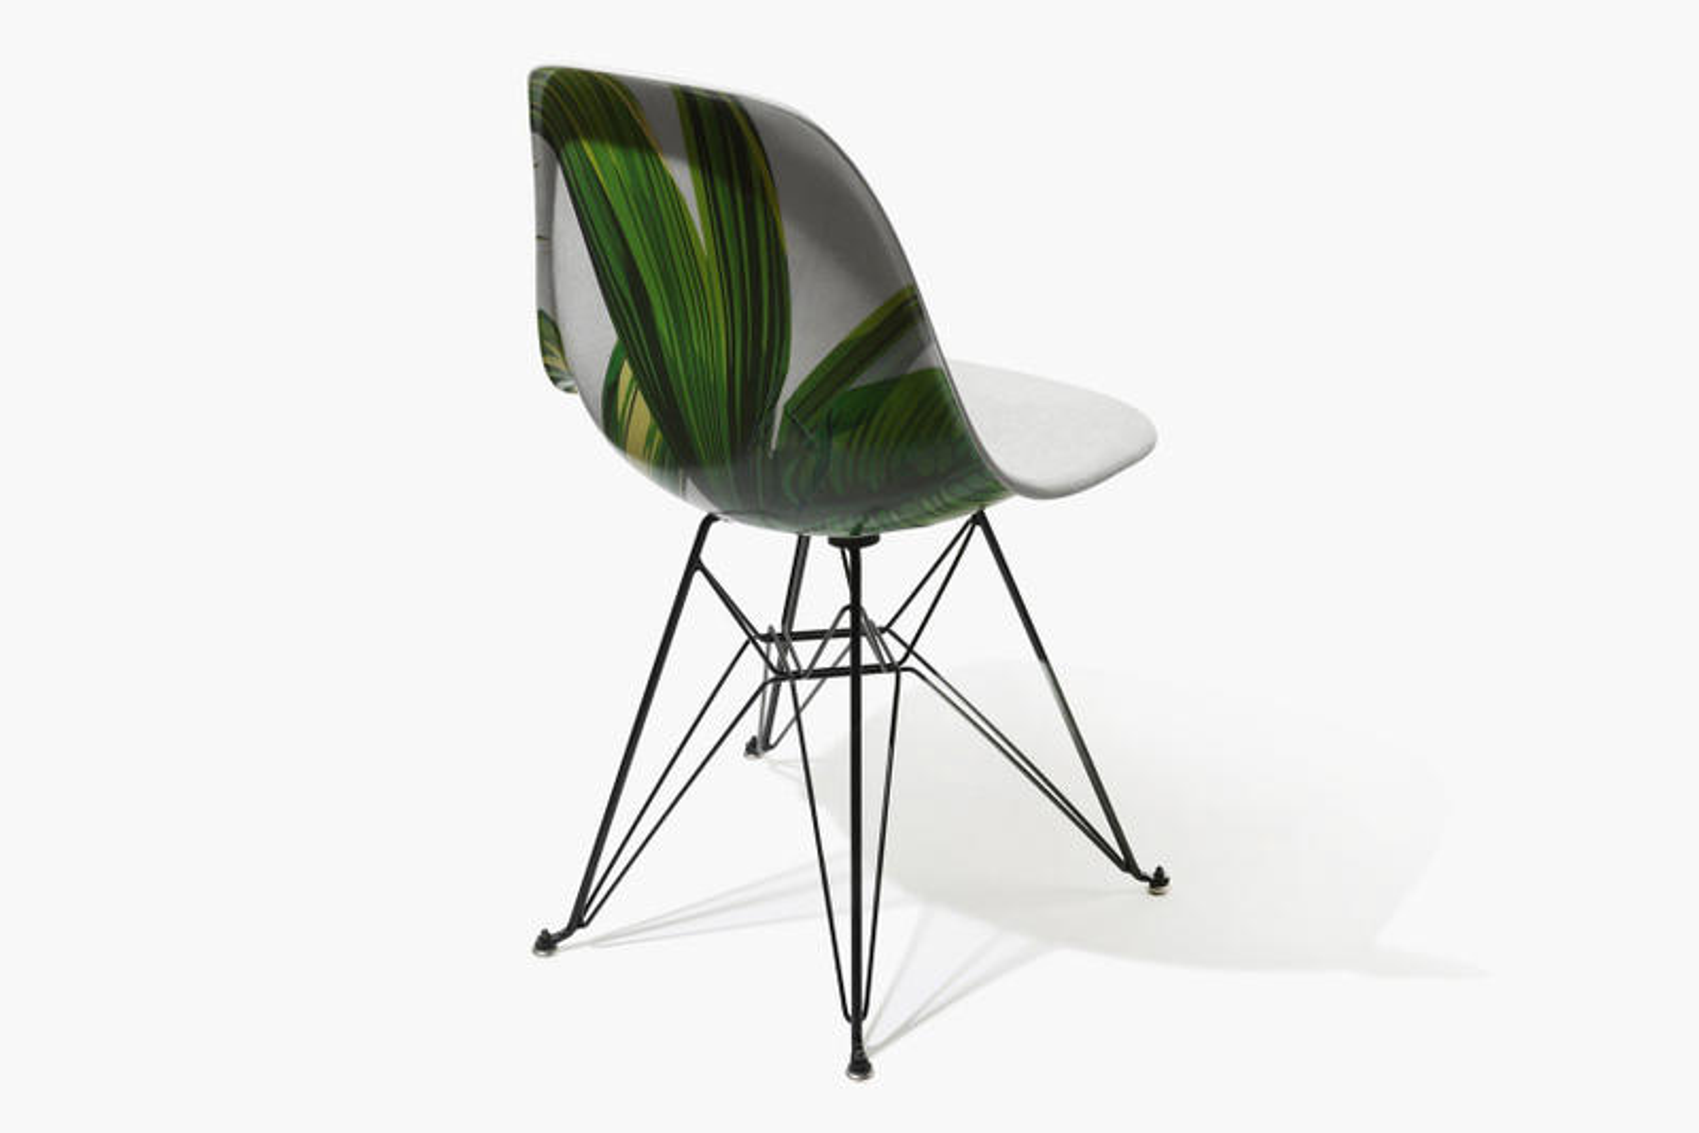 Garrett Leight & Modernica Collaborate on Palm-Themed Chair